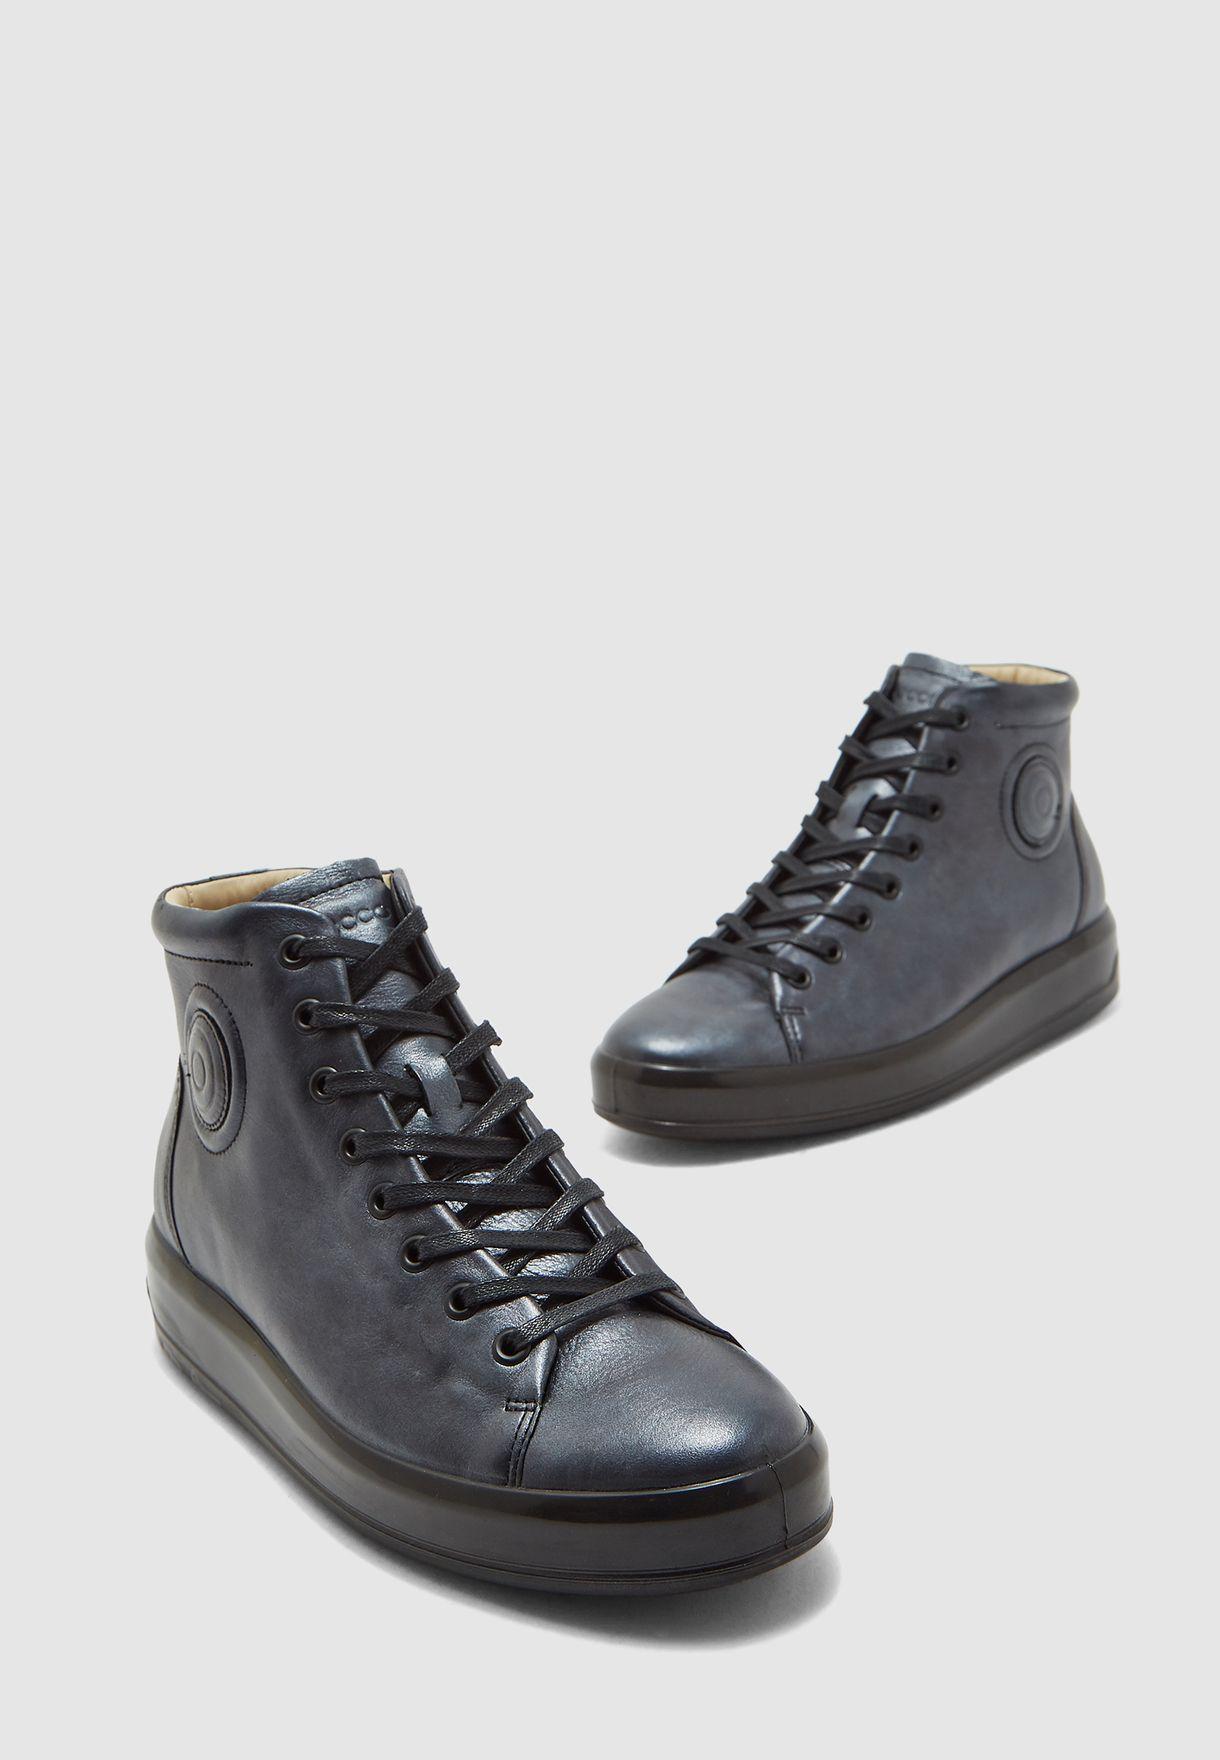 Buy Ecco grey High Top Sneakers for